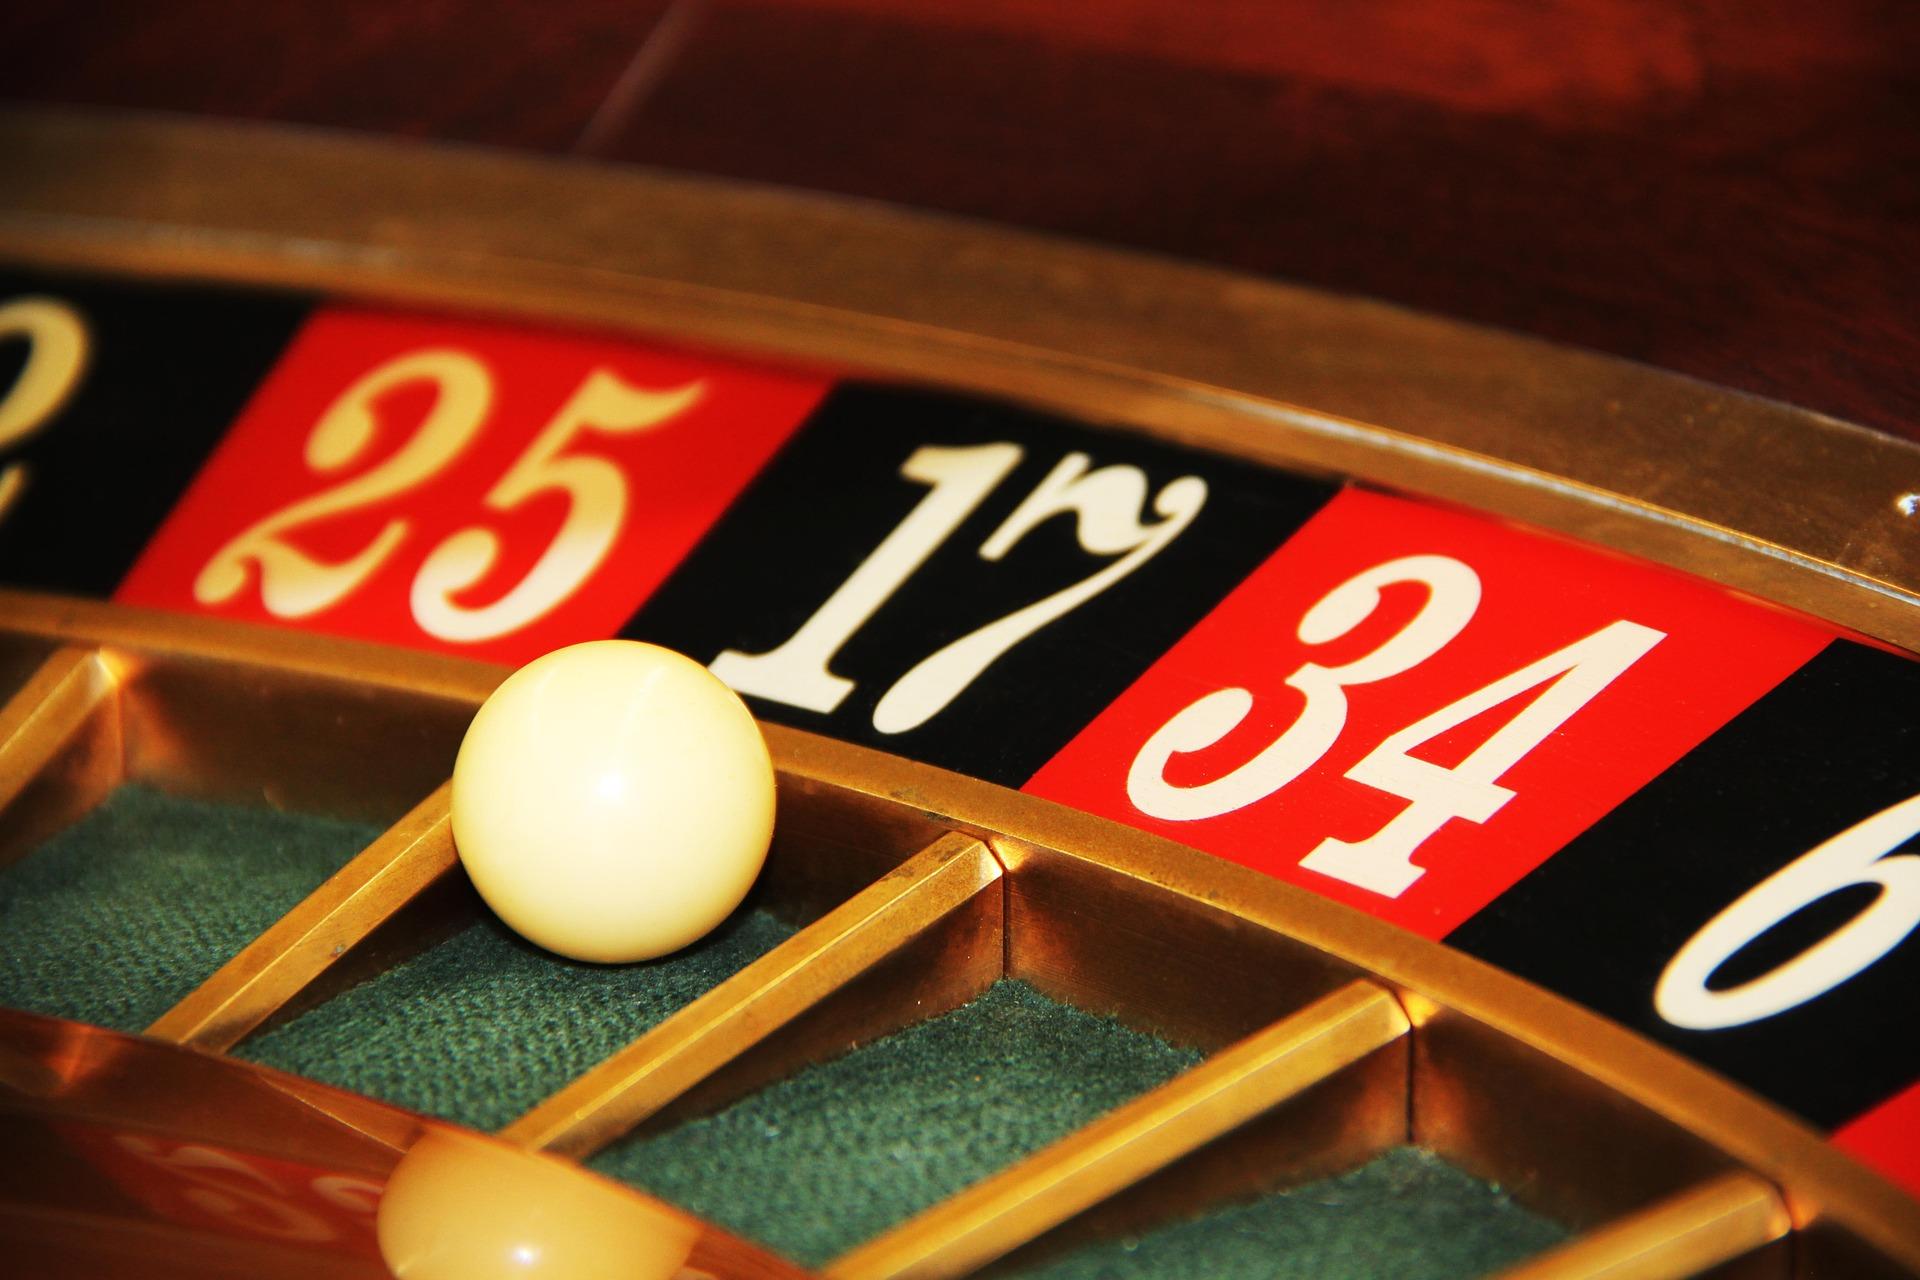 Hazard pozitivně č. 2